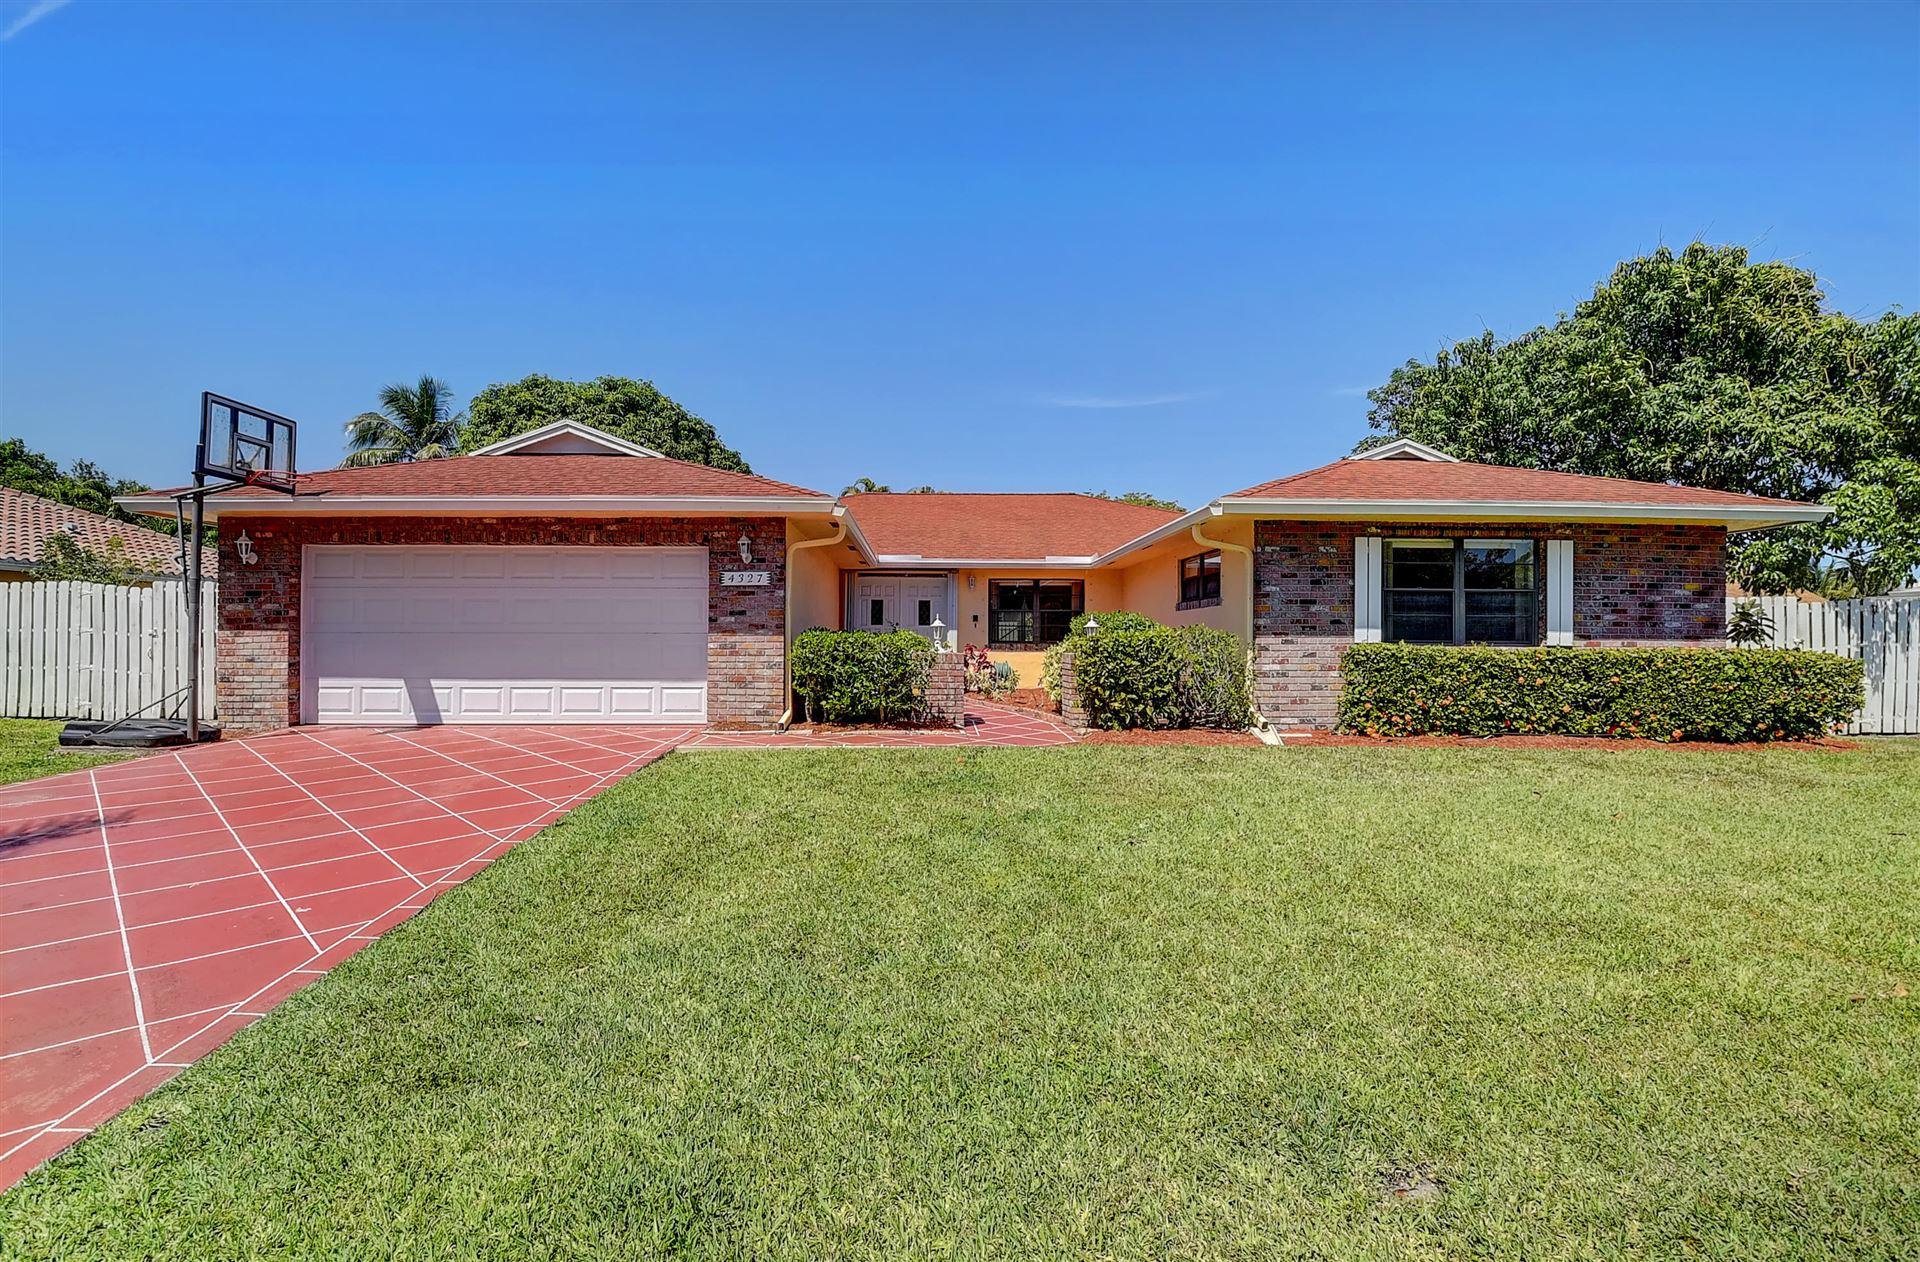 Photo of 4327 Juniper Terrace, Boynton Beach, FL 33436 (MLS # RX-10697187)